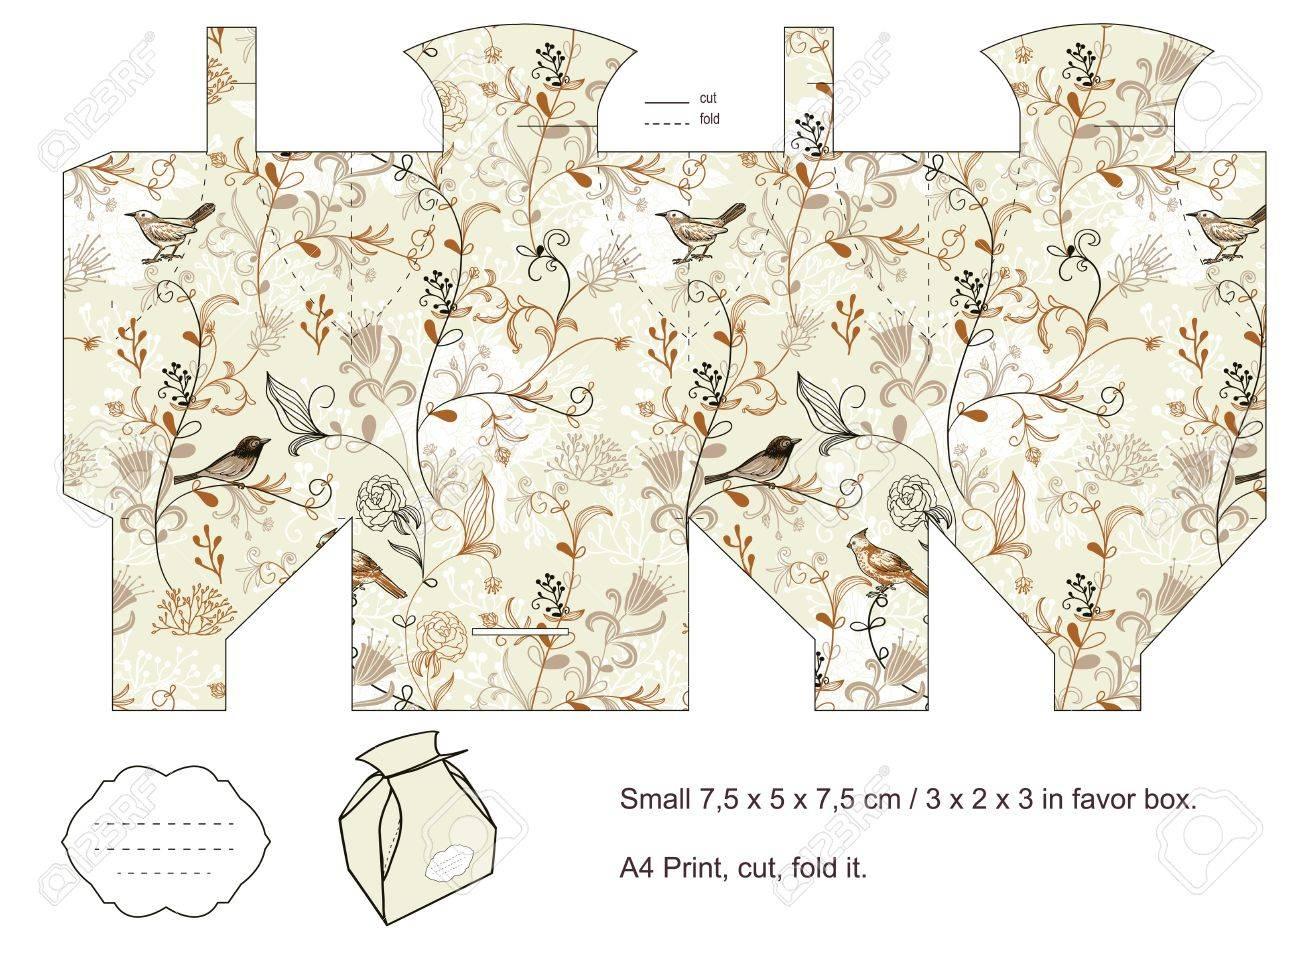 Favor box die cut  Birds, plants, flowers pattern  Empty label Stock Vector - 14574431